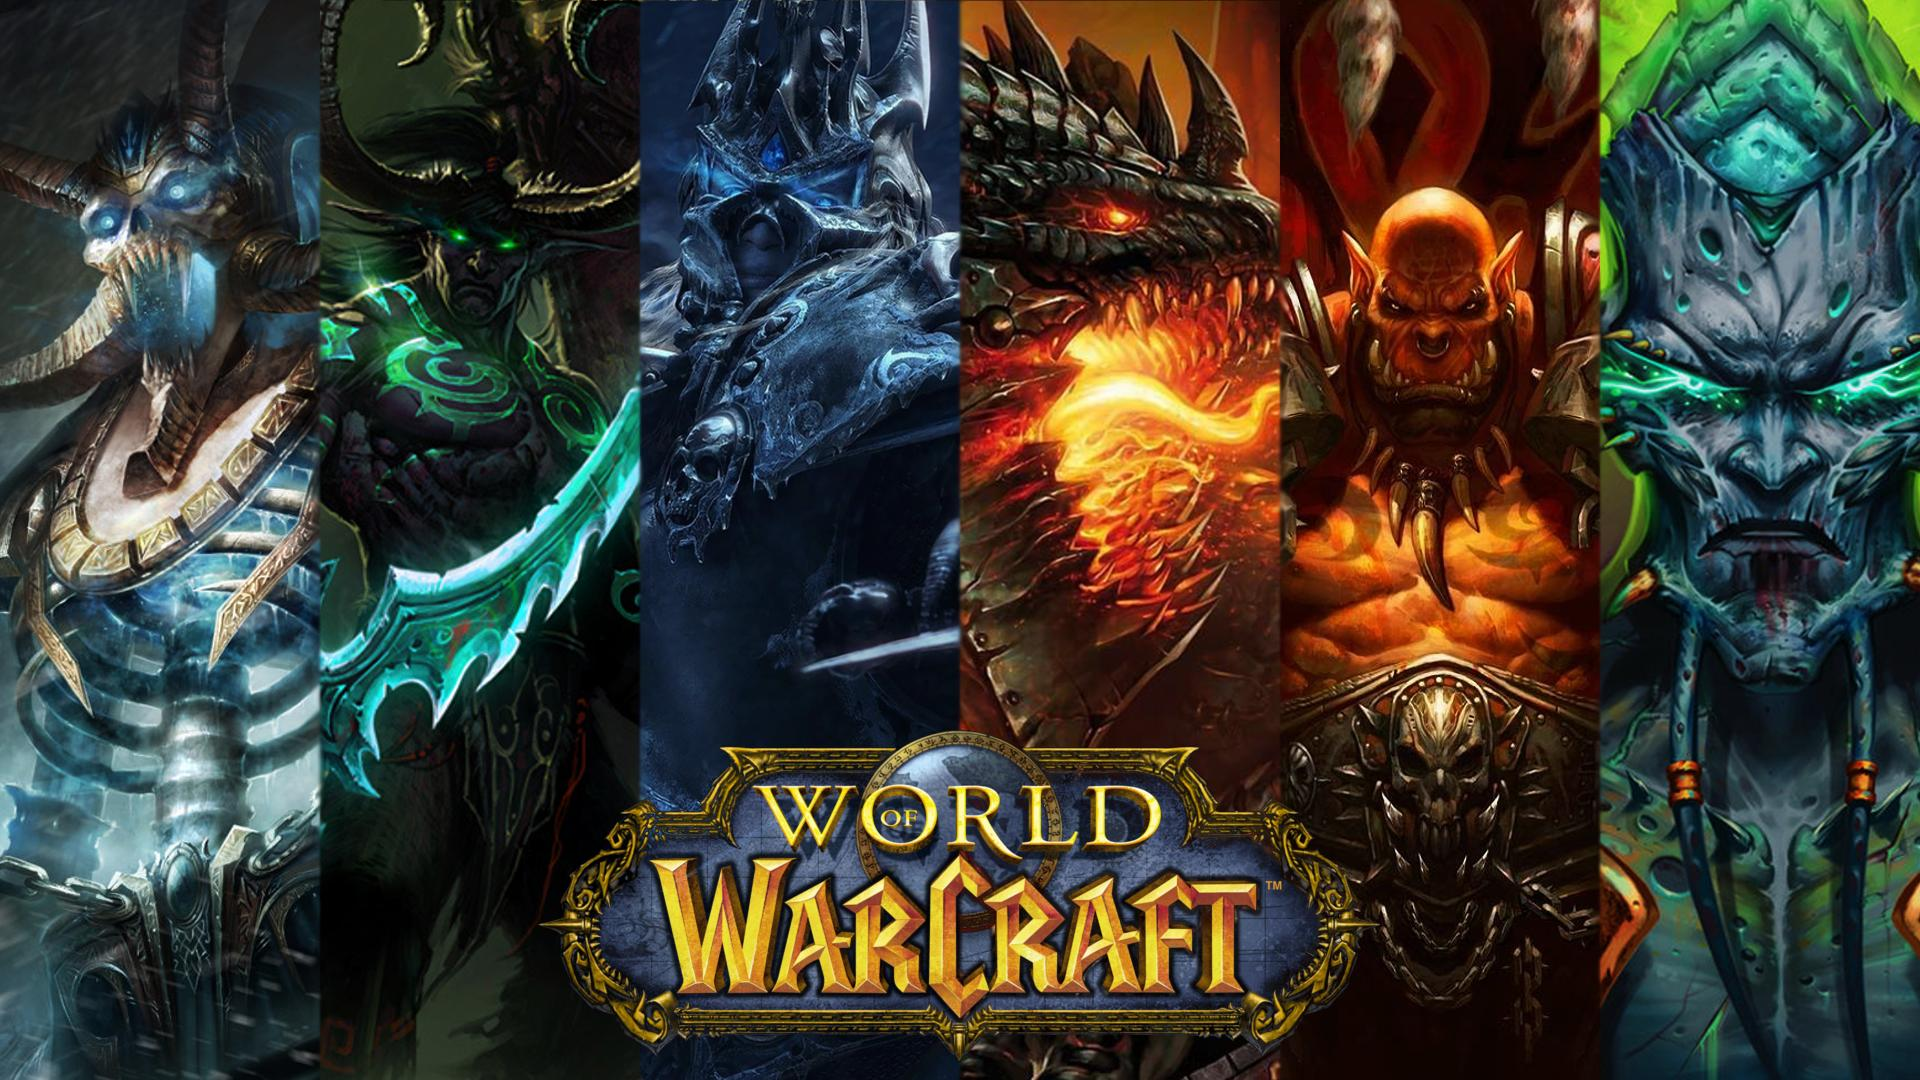 Картинки по запросу World of Warcraft